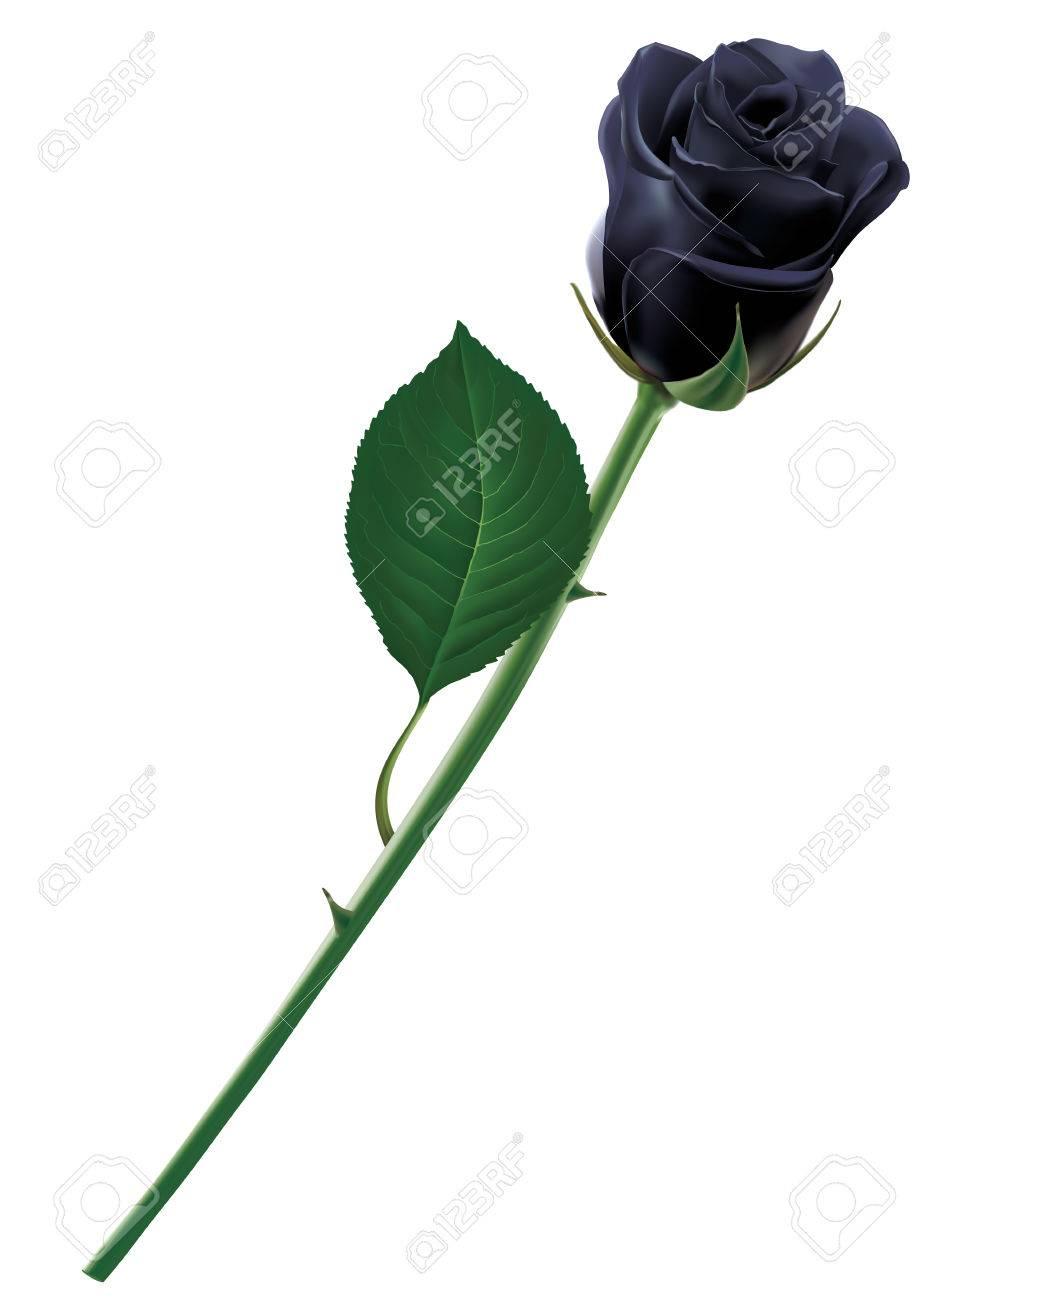 Black rose isolated. Realistic illustration - 56695718